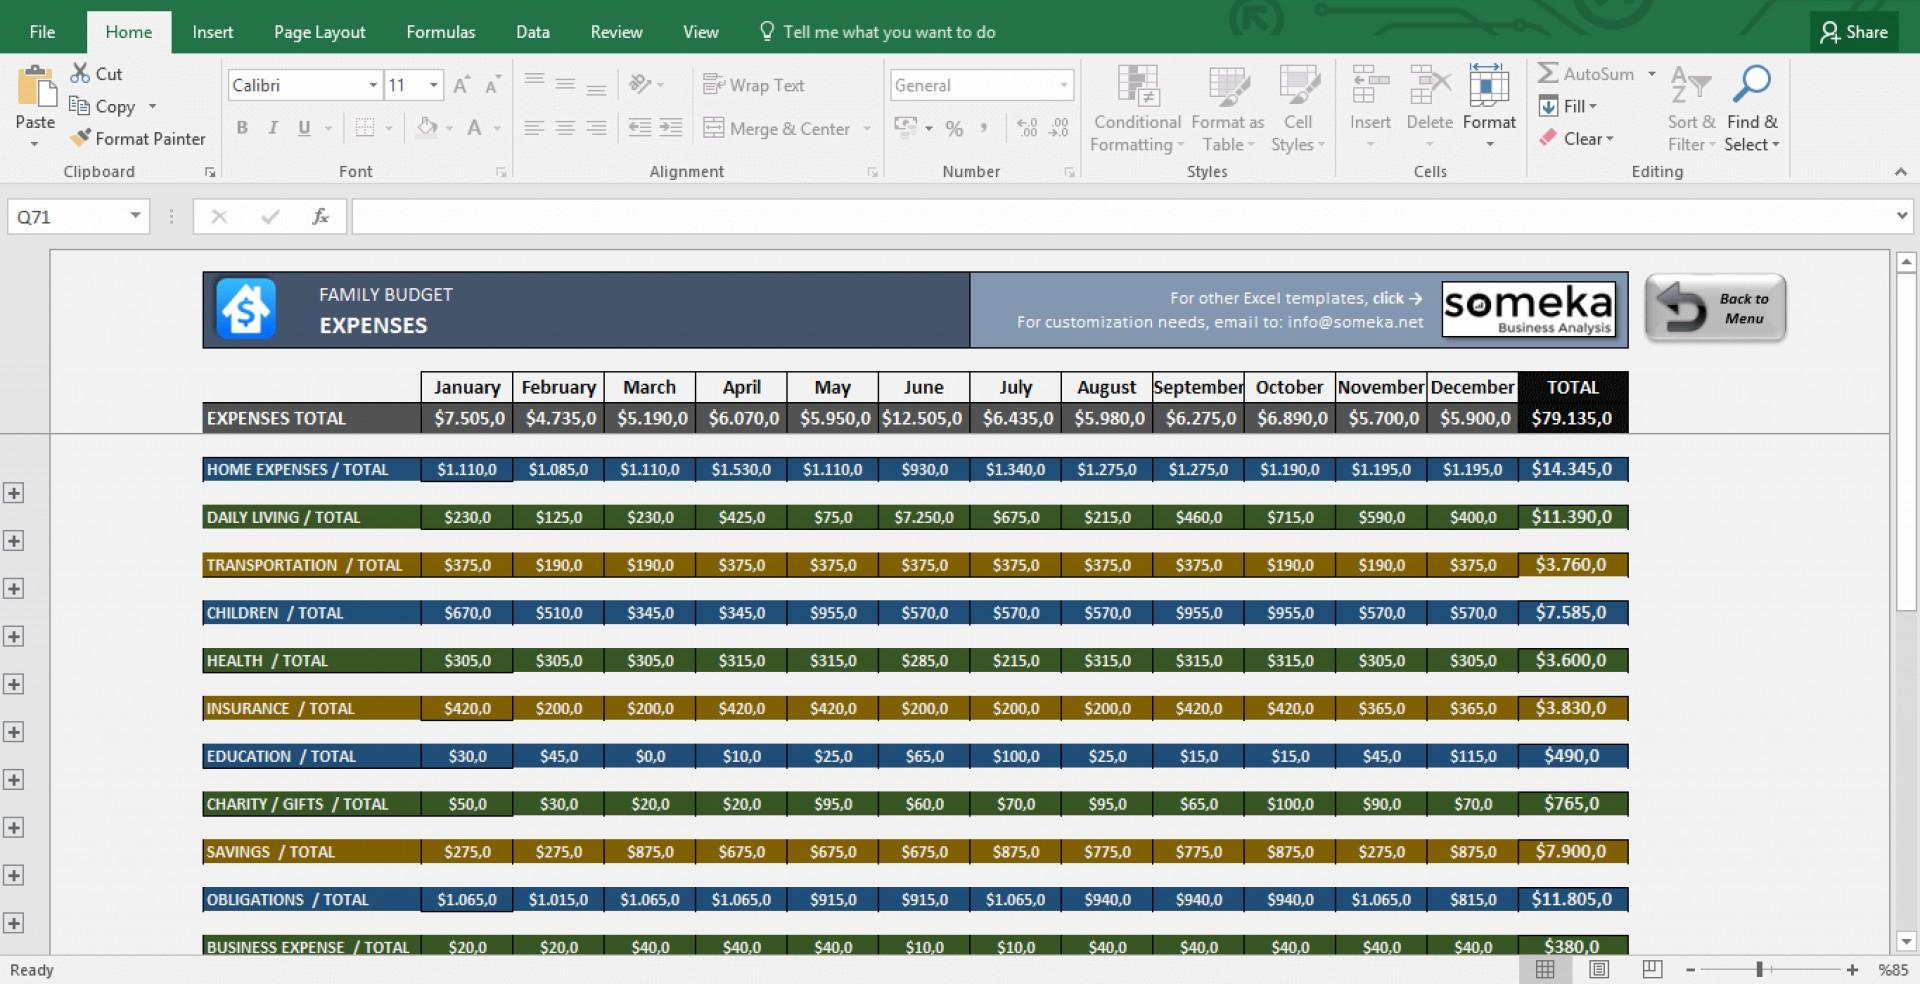 Household Budget Spreadsheet regarding 022 Template Ideas Free Home Budget Spreadsheet Uk Personal